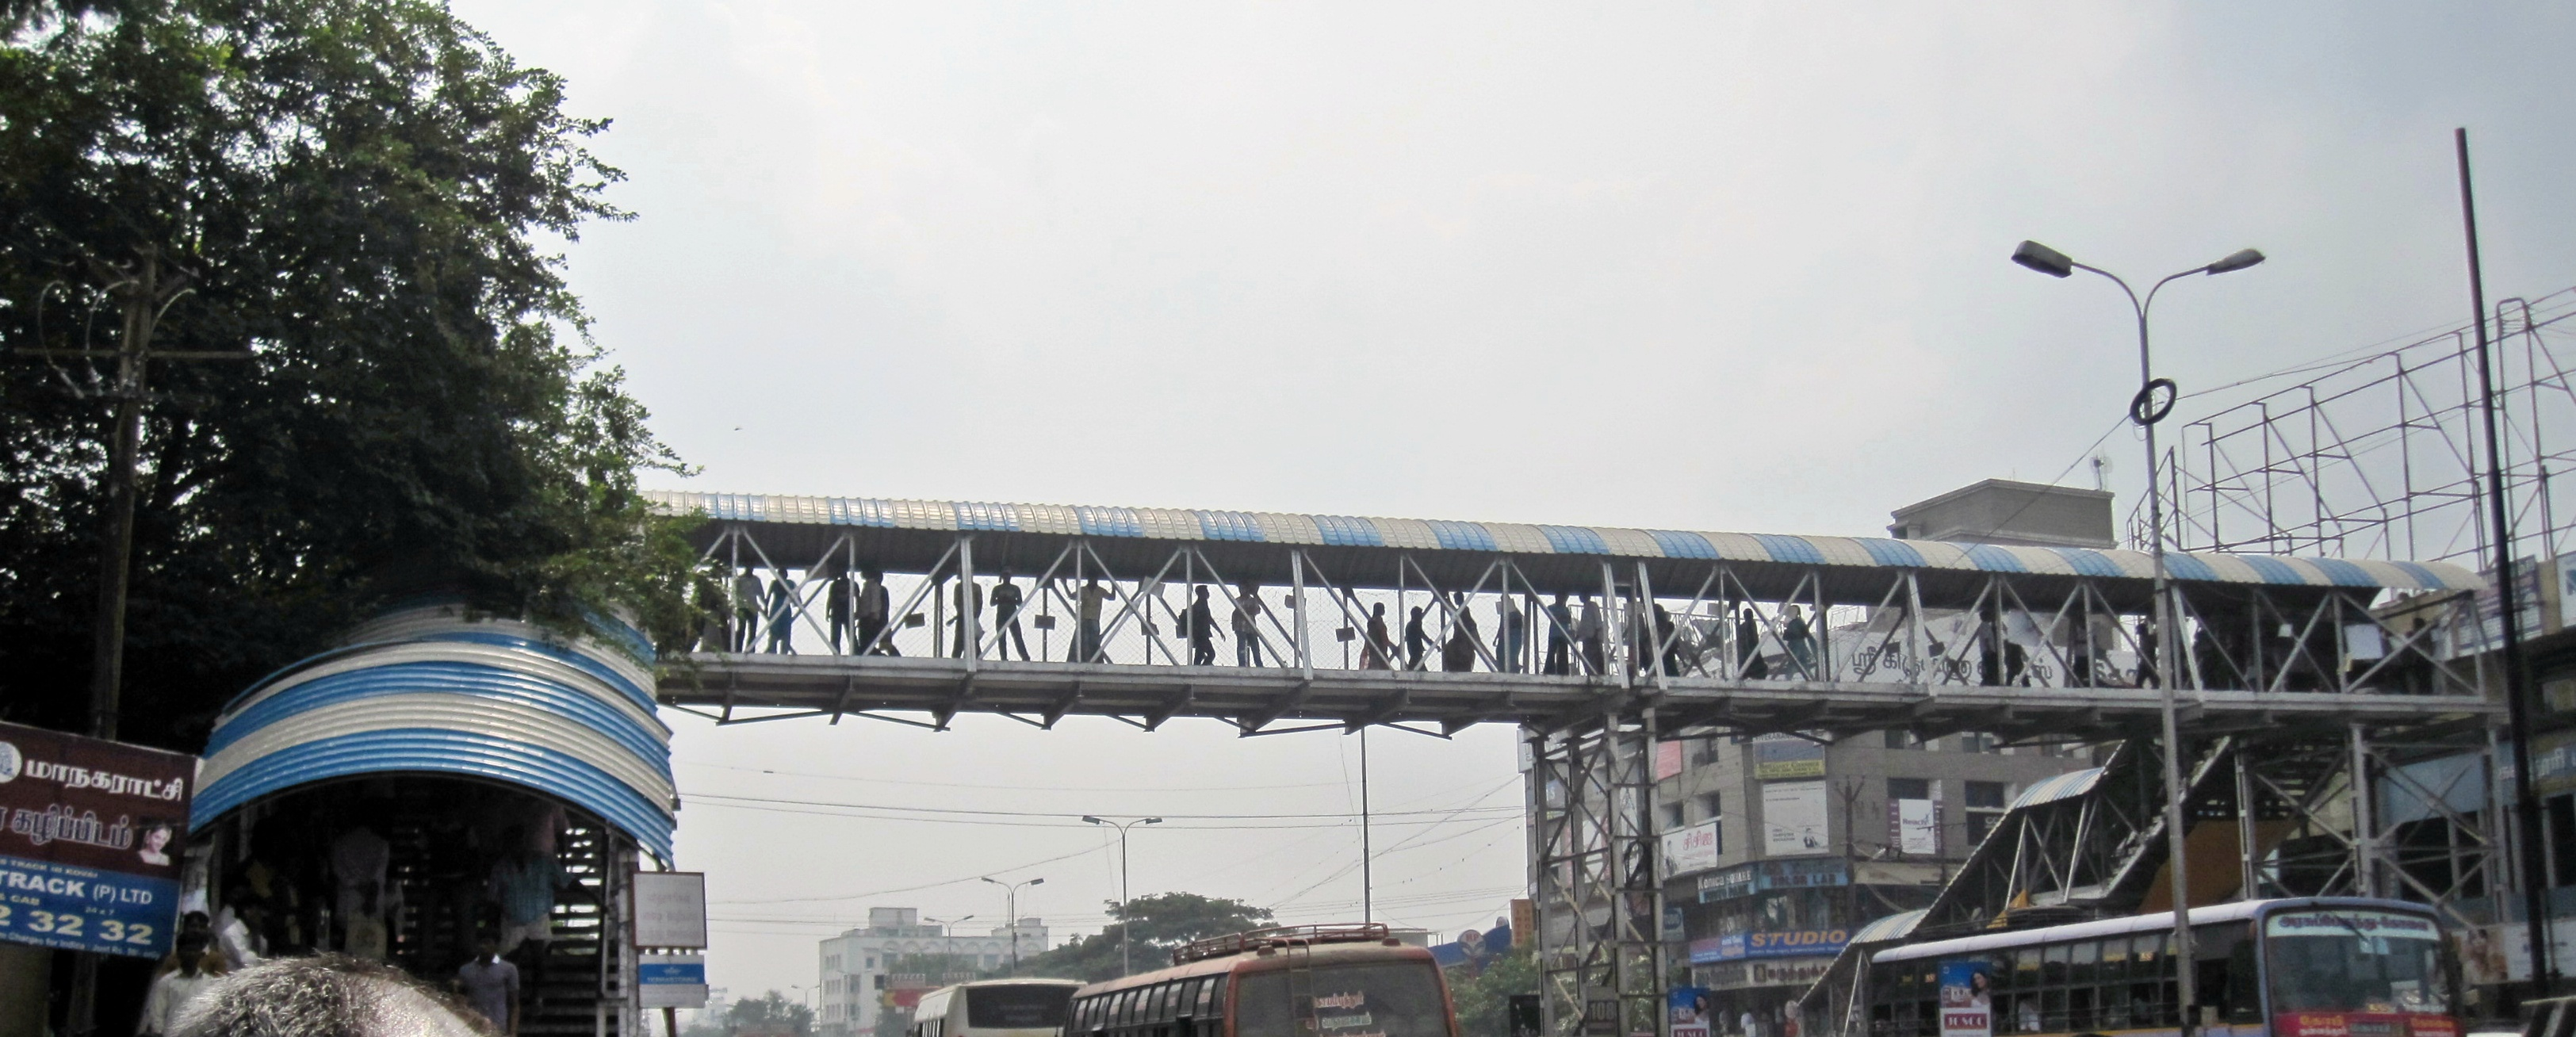 Gandhipuram_pedestrian_overbridge-Coimbatore